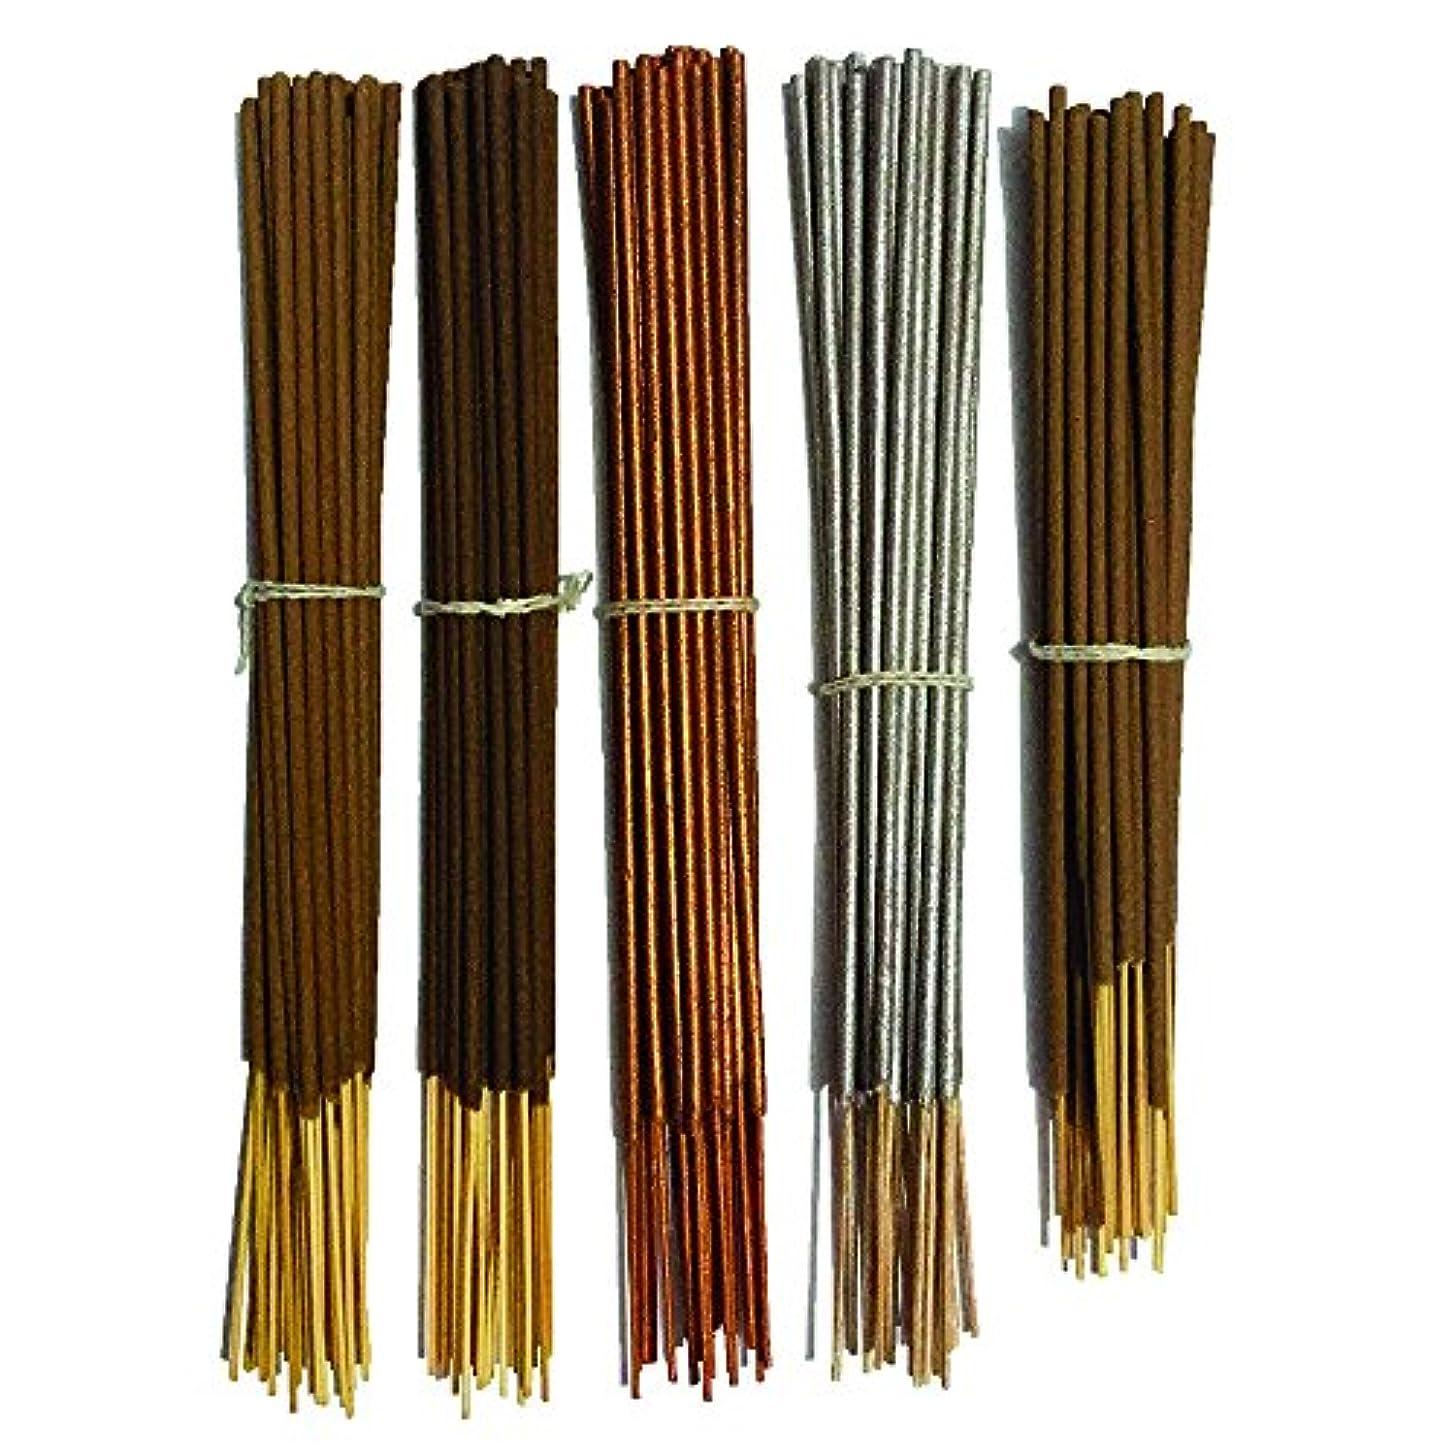 Inaki Incense Sticksプレミアム5 Fragrance Infused with Essential Oilsパック40 gm各 – Natural長持ちホーム&インドアFragrance (200グラムパック)